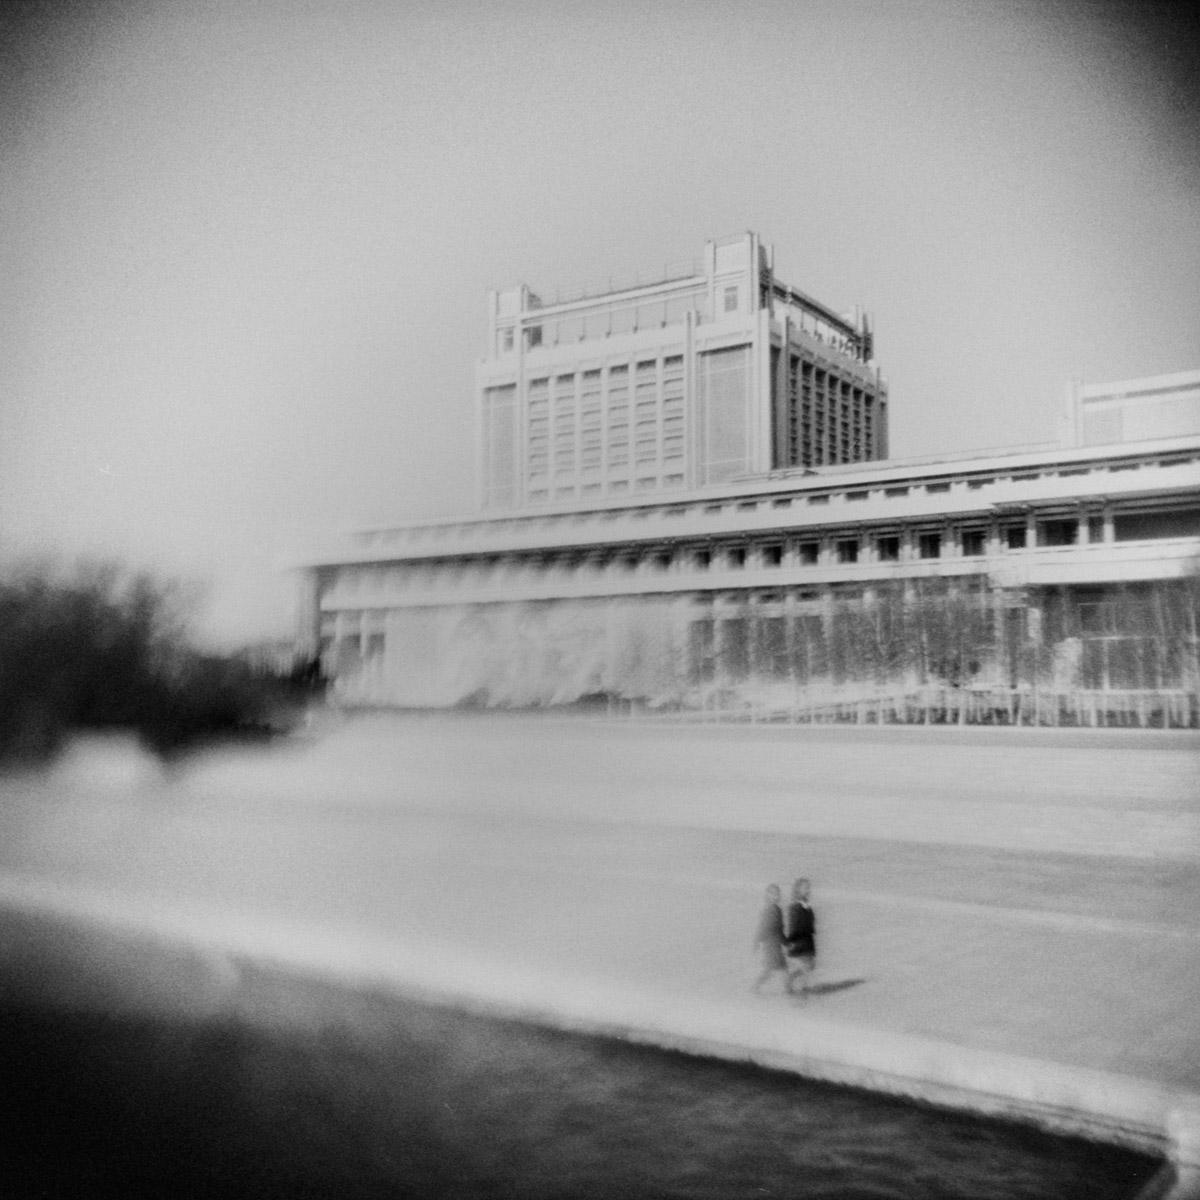 Two children walk along an empty street in Pyongyang, the capital of North Korea.